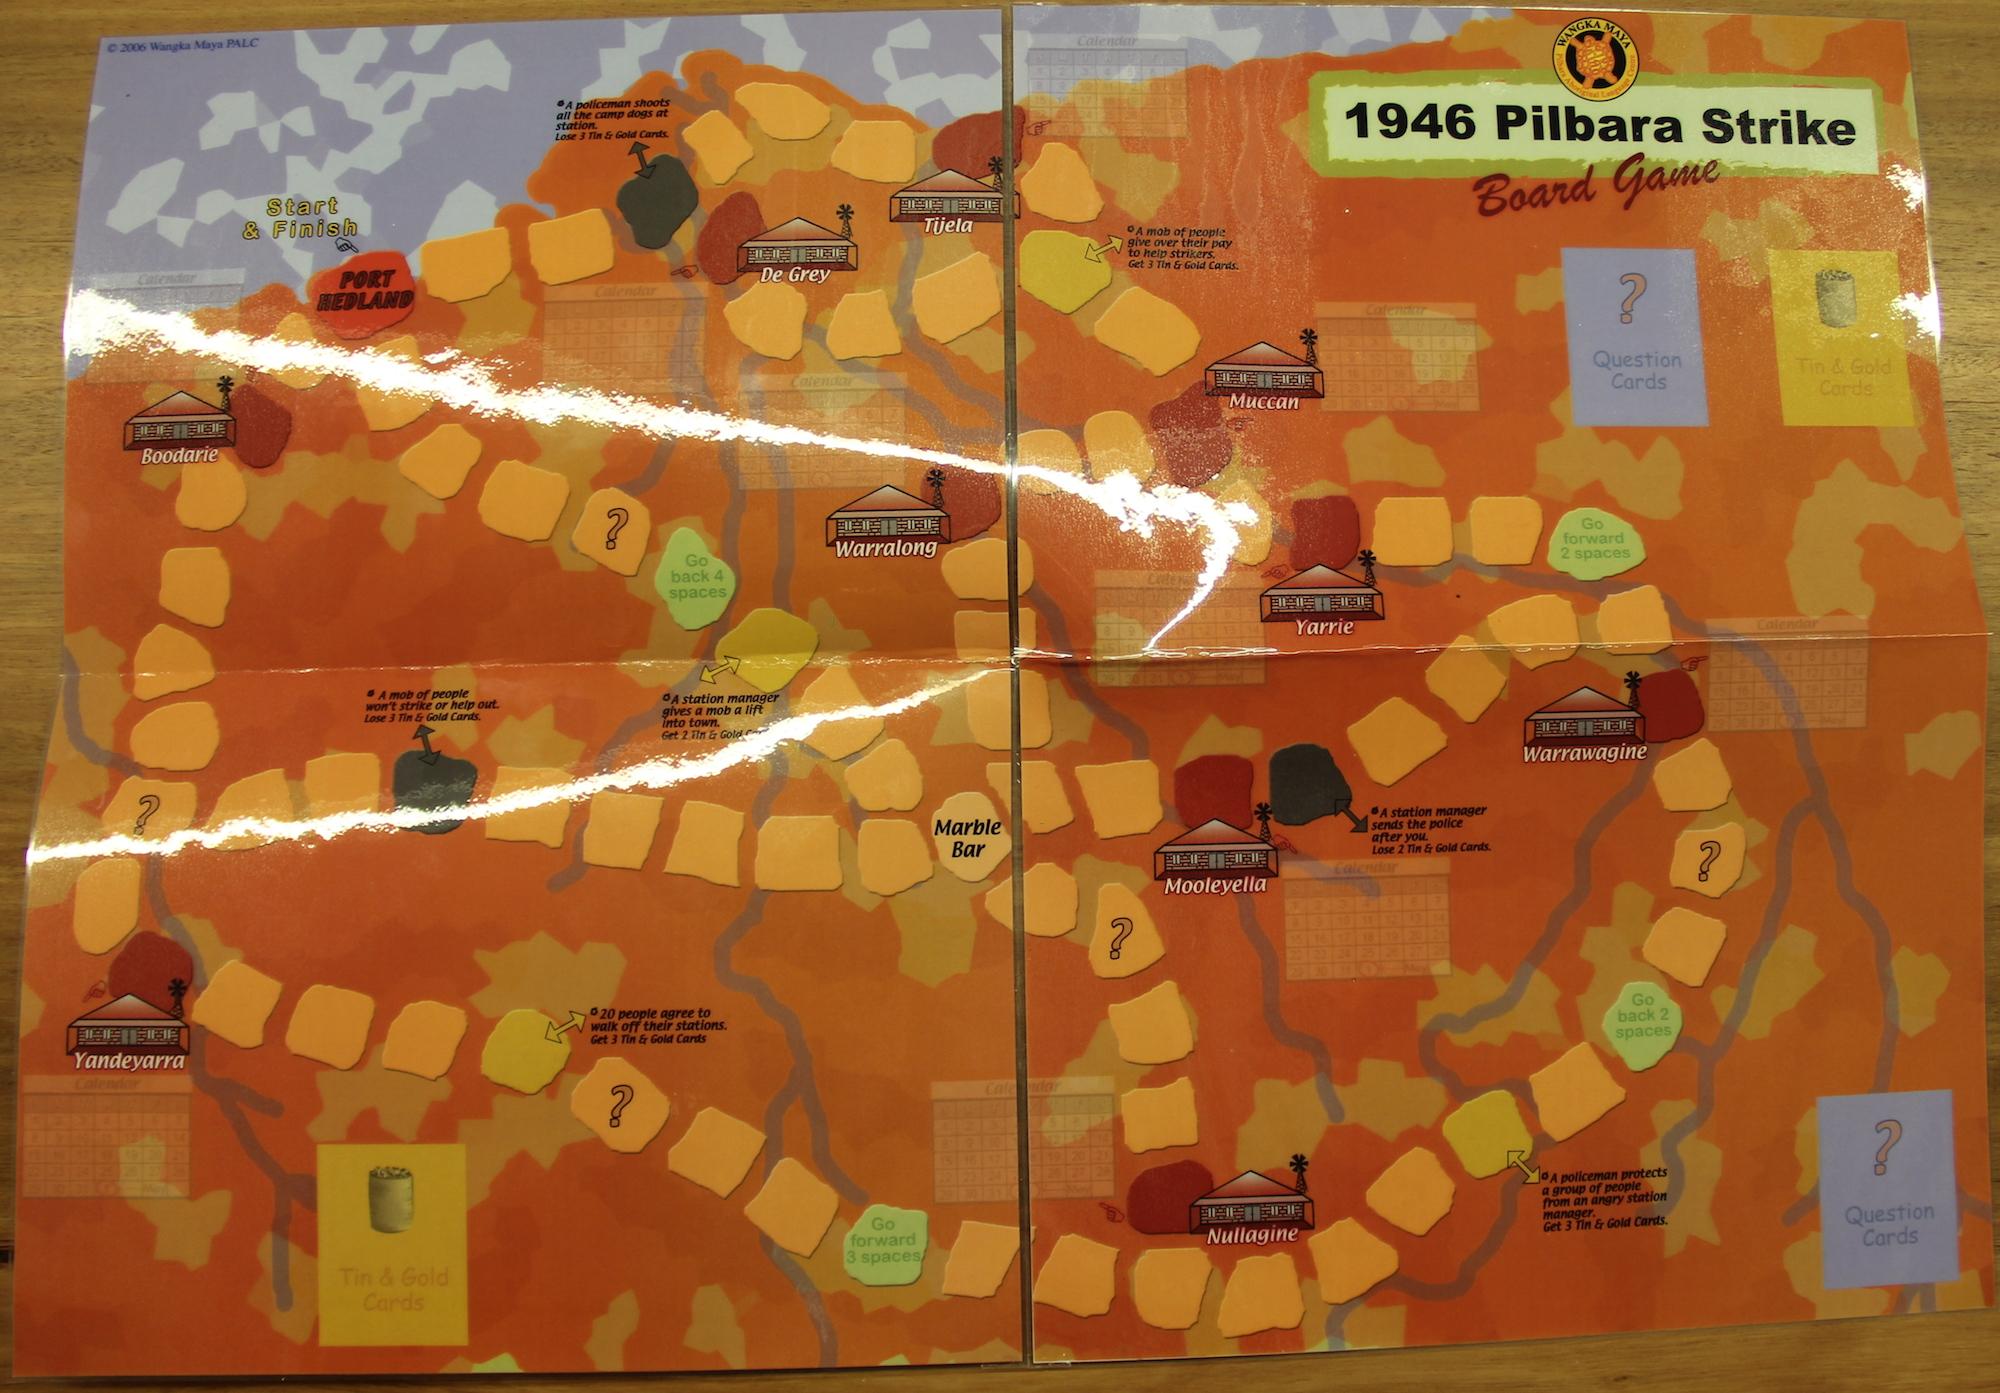 The 1946 Pilbara Strike Game Board